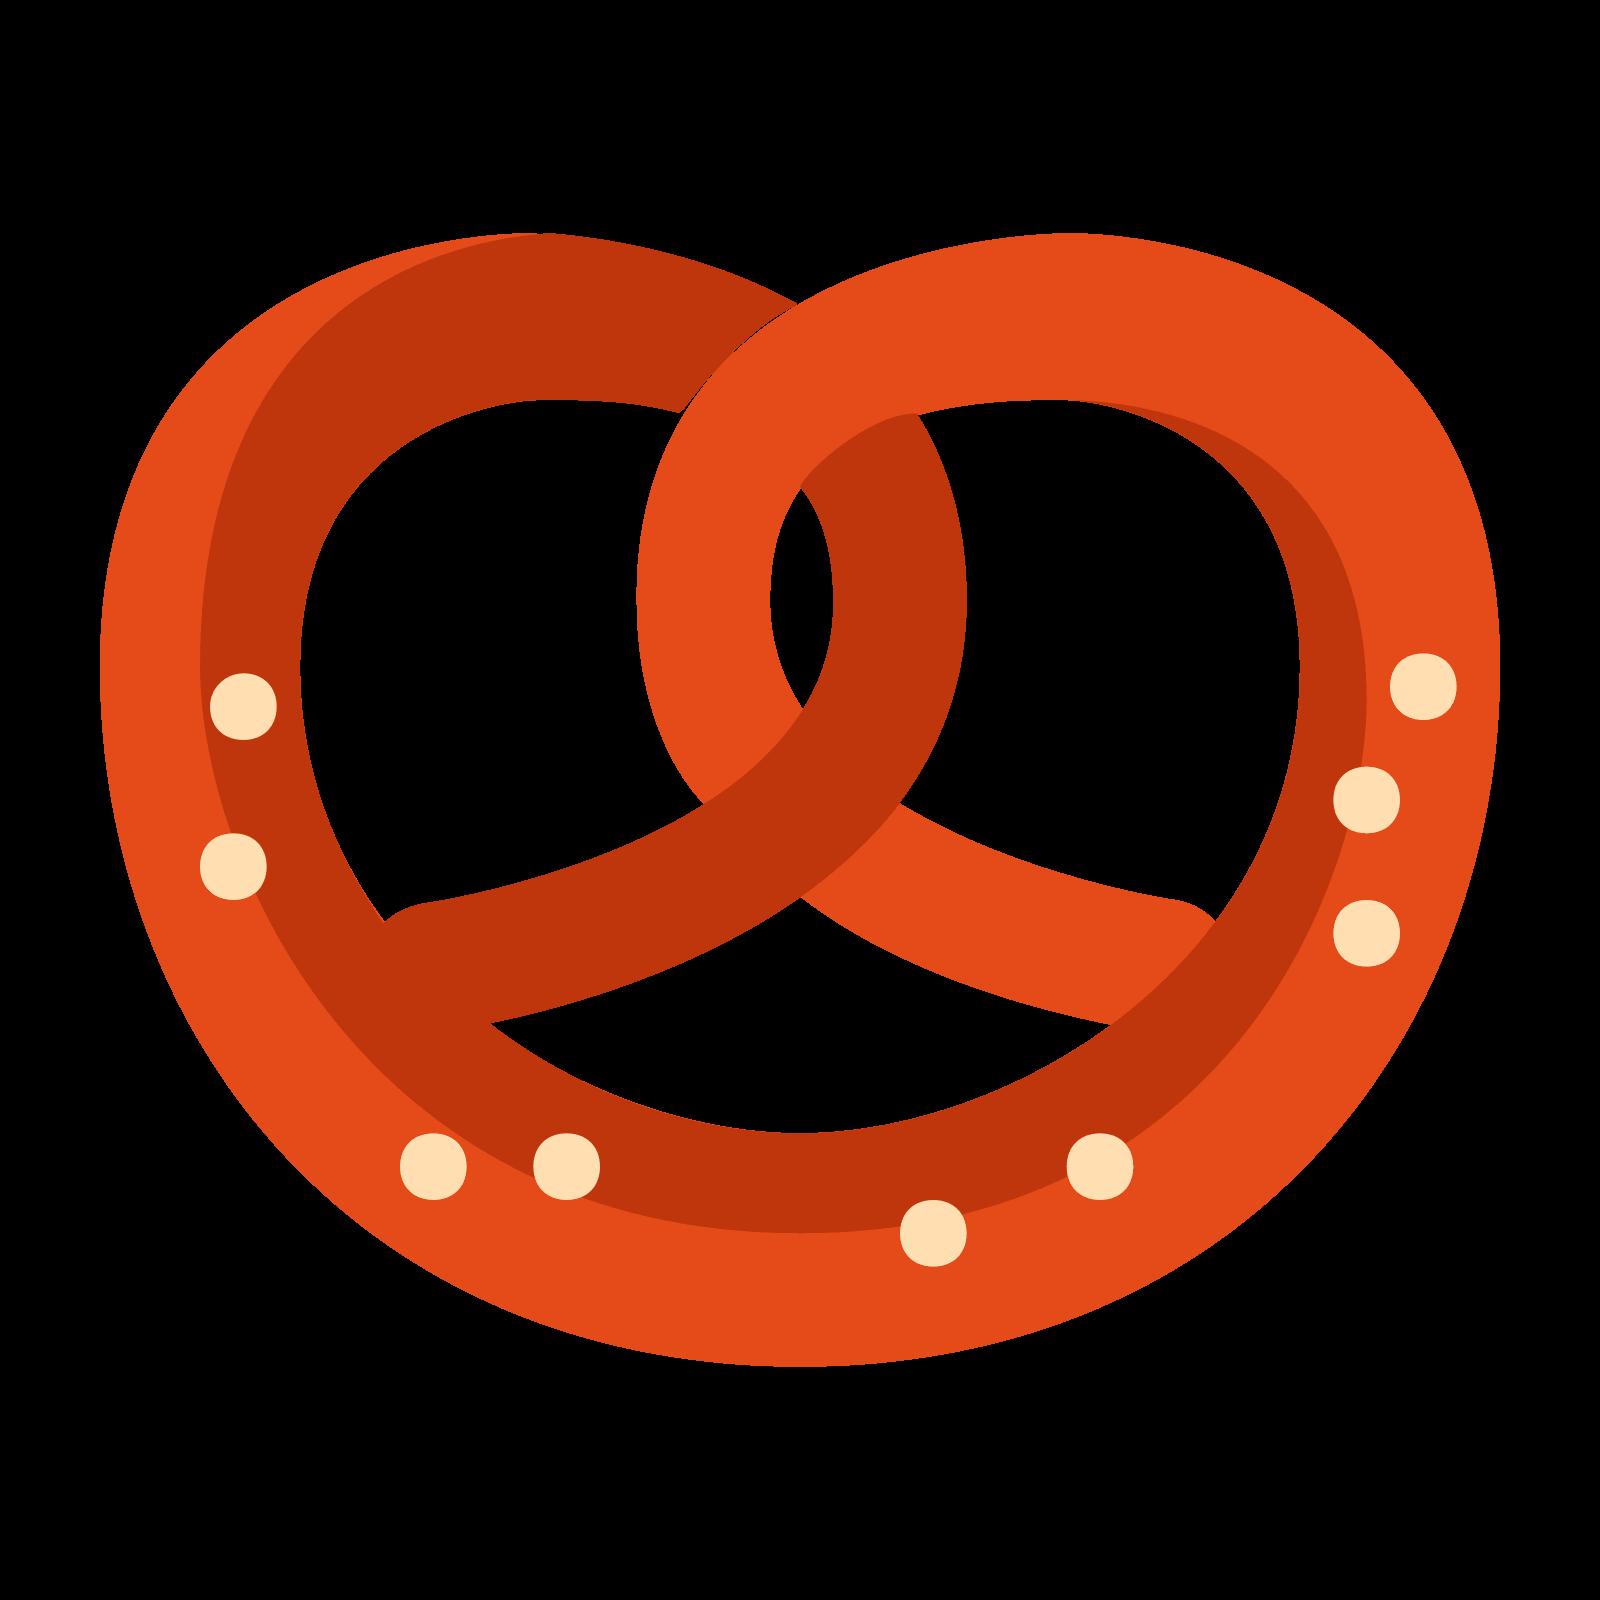 German clipart bavarian pretzel. Brezel icon free download